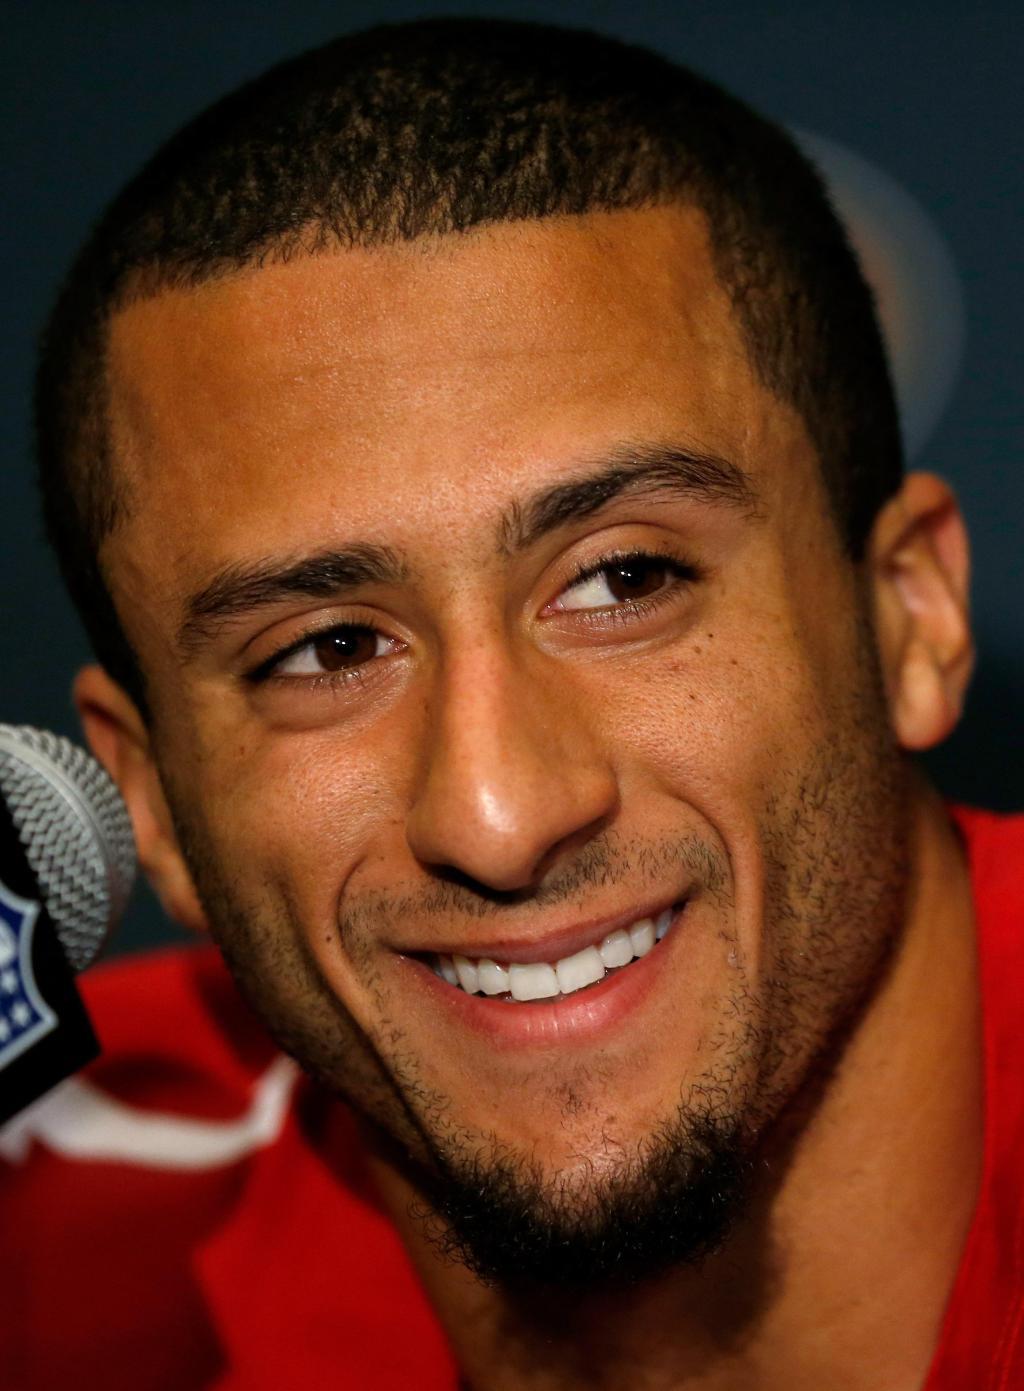 San Francisco 49ers Super Bowl XLVII Media Availability